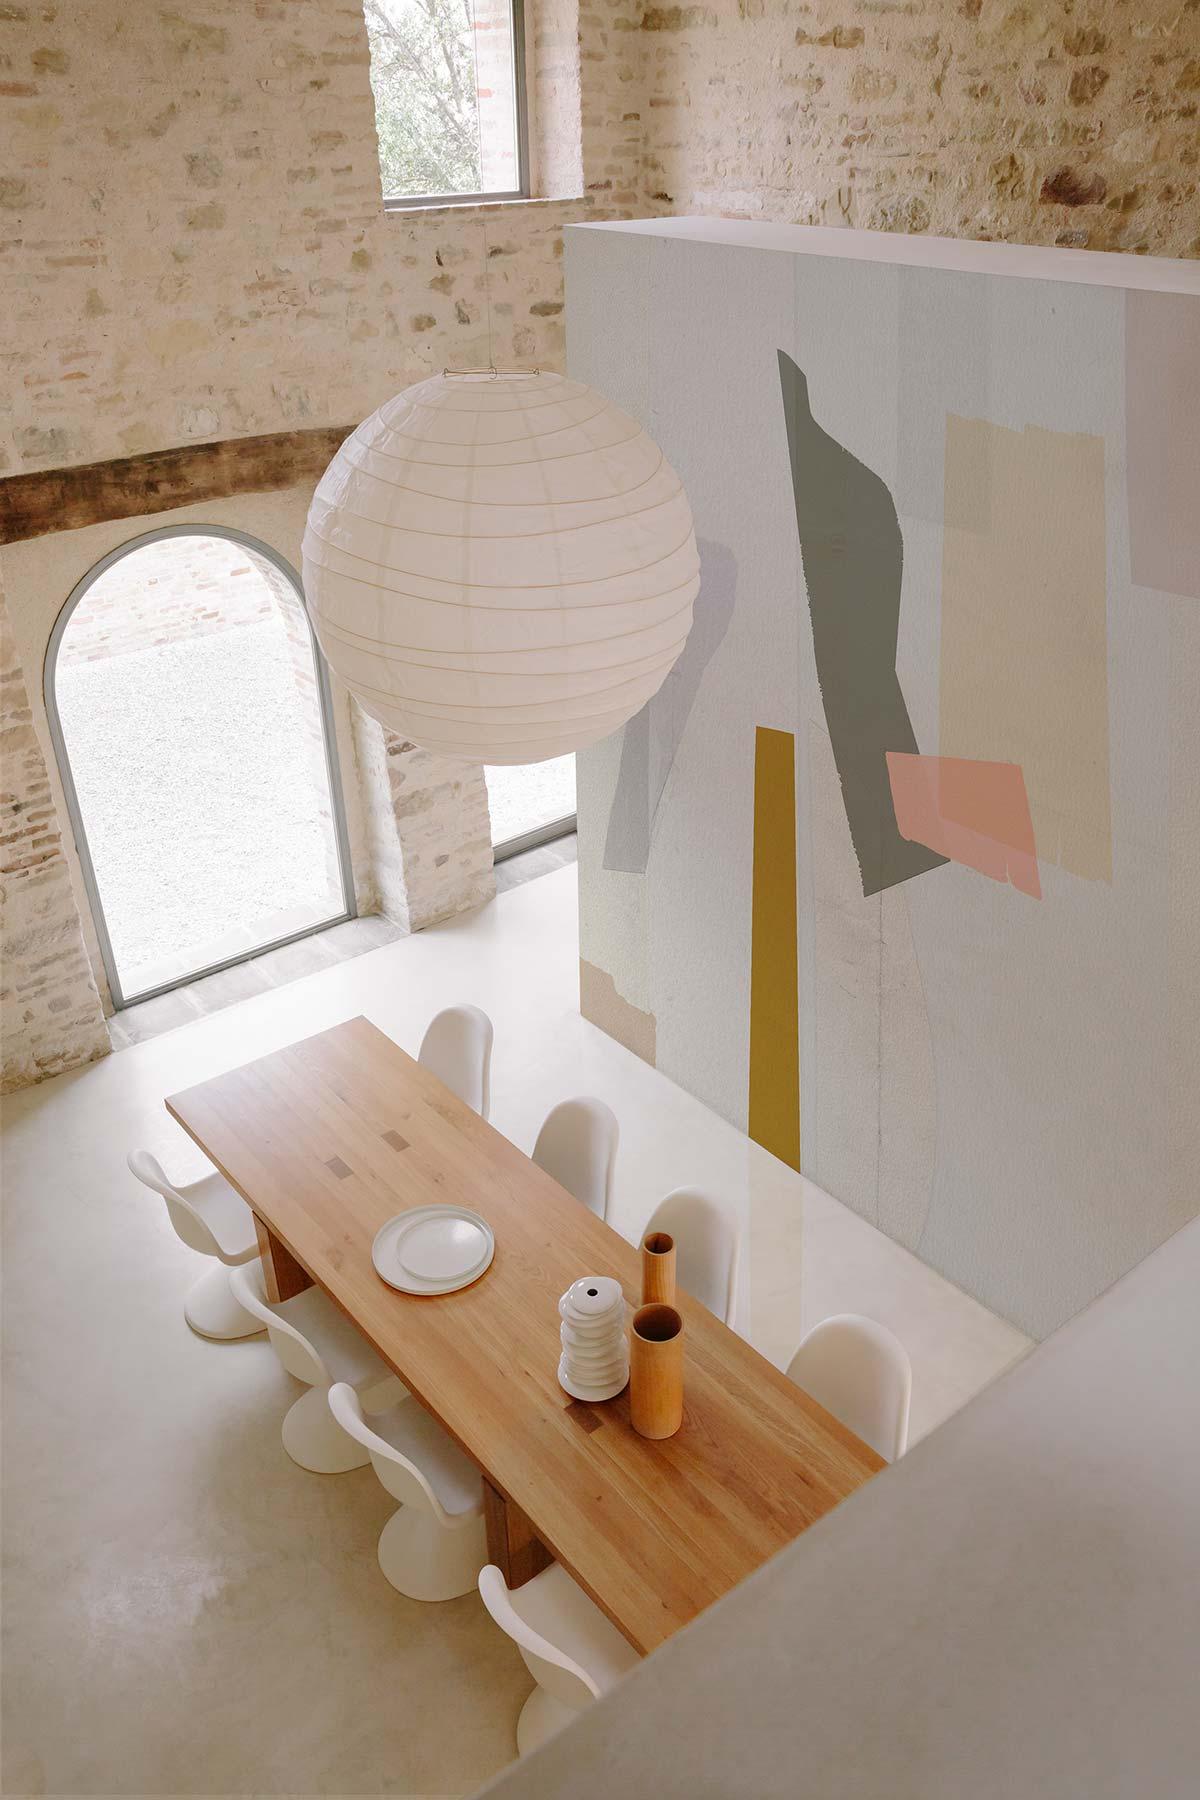 Papercut by Wall&deco, Design Studio Salaris & Sans Nom Studio